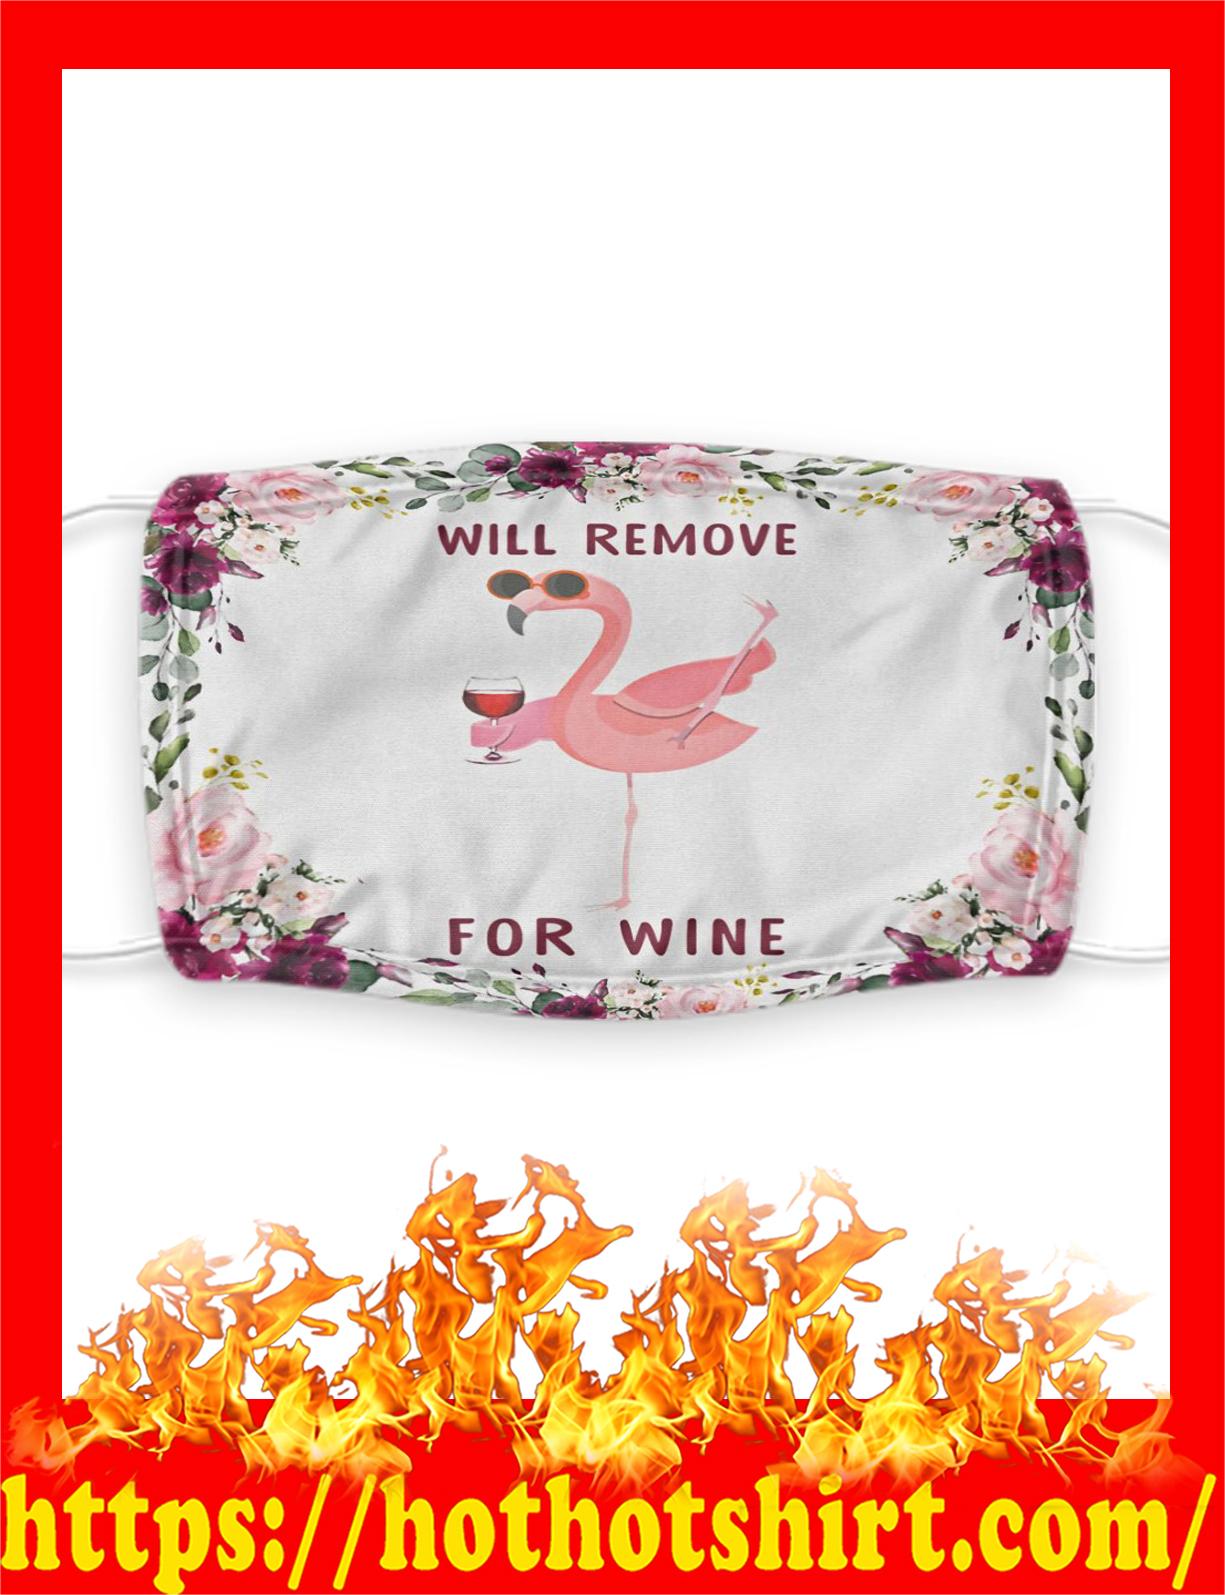 Flamingo will remove for wine face mask - pic 2